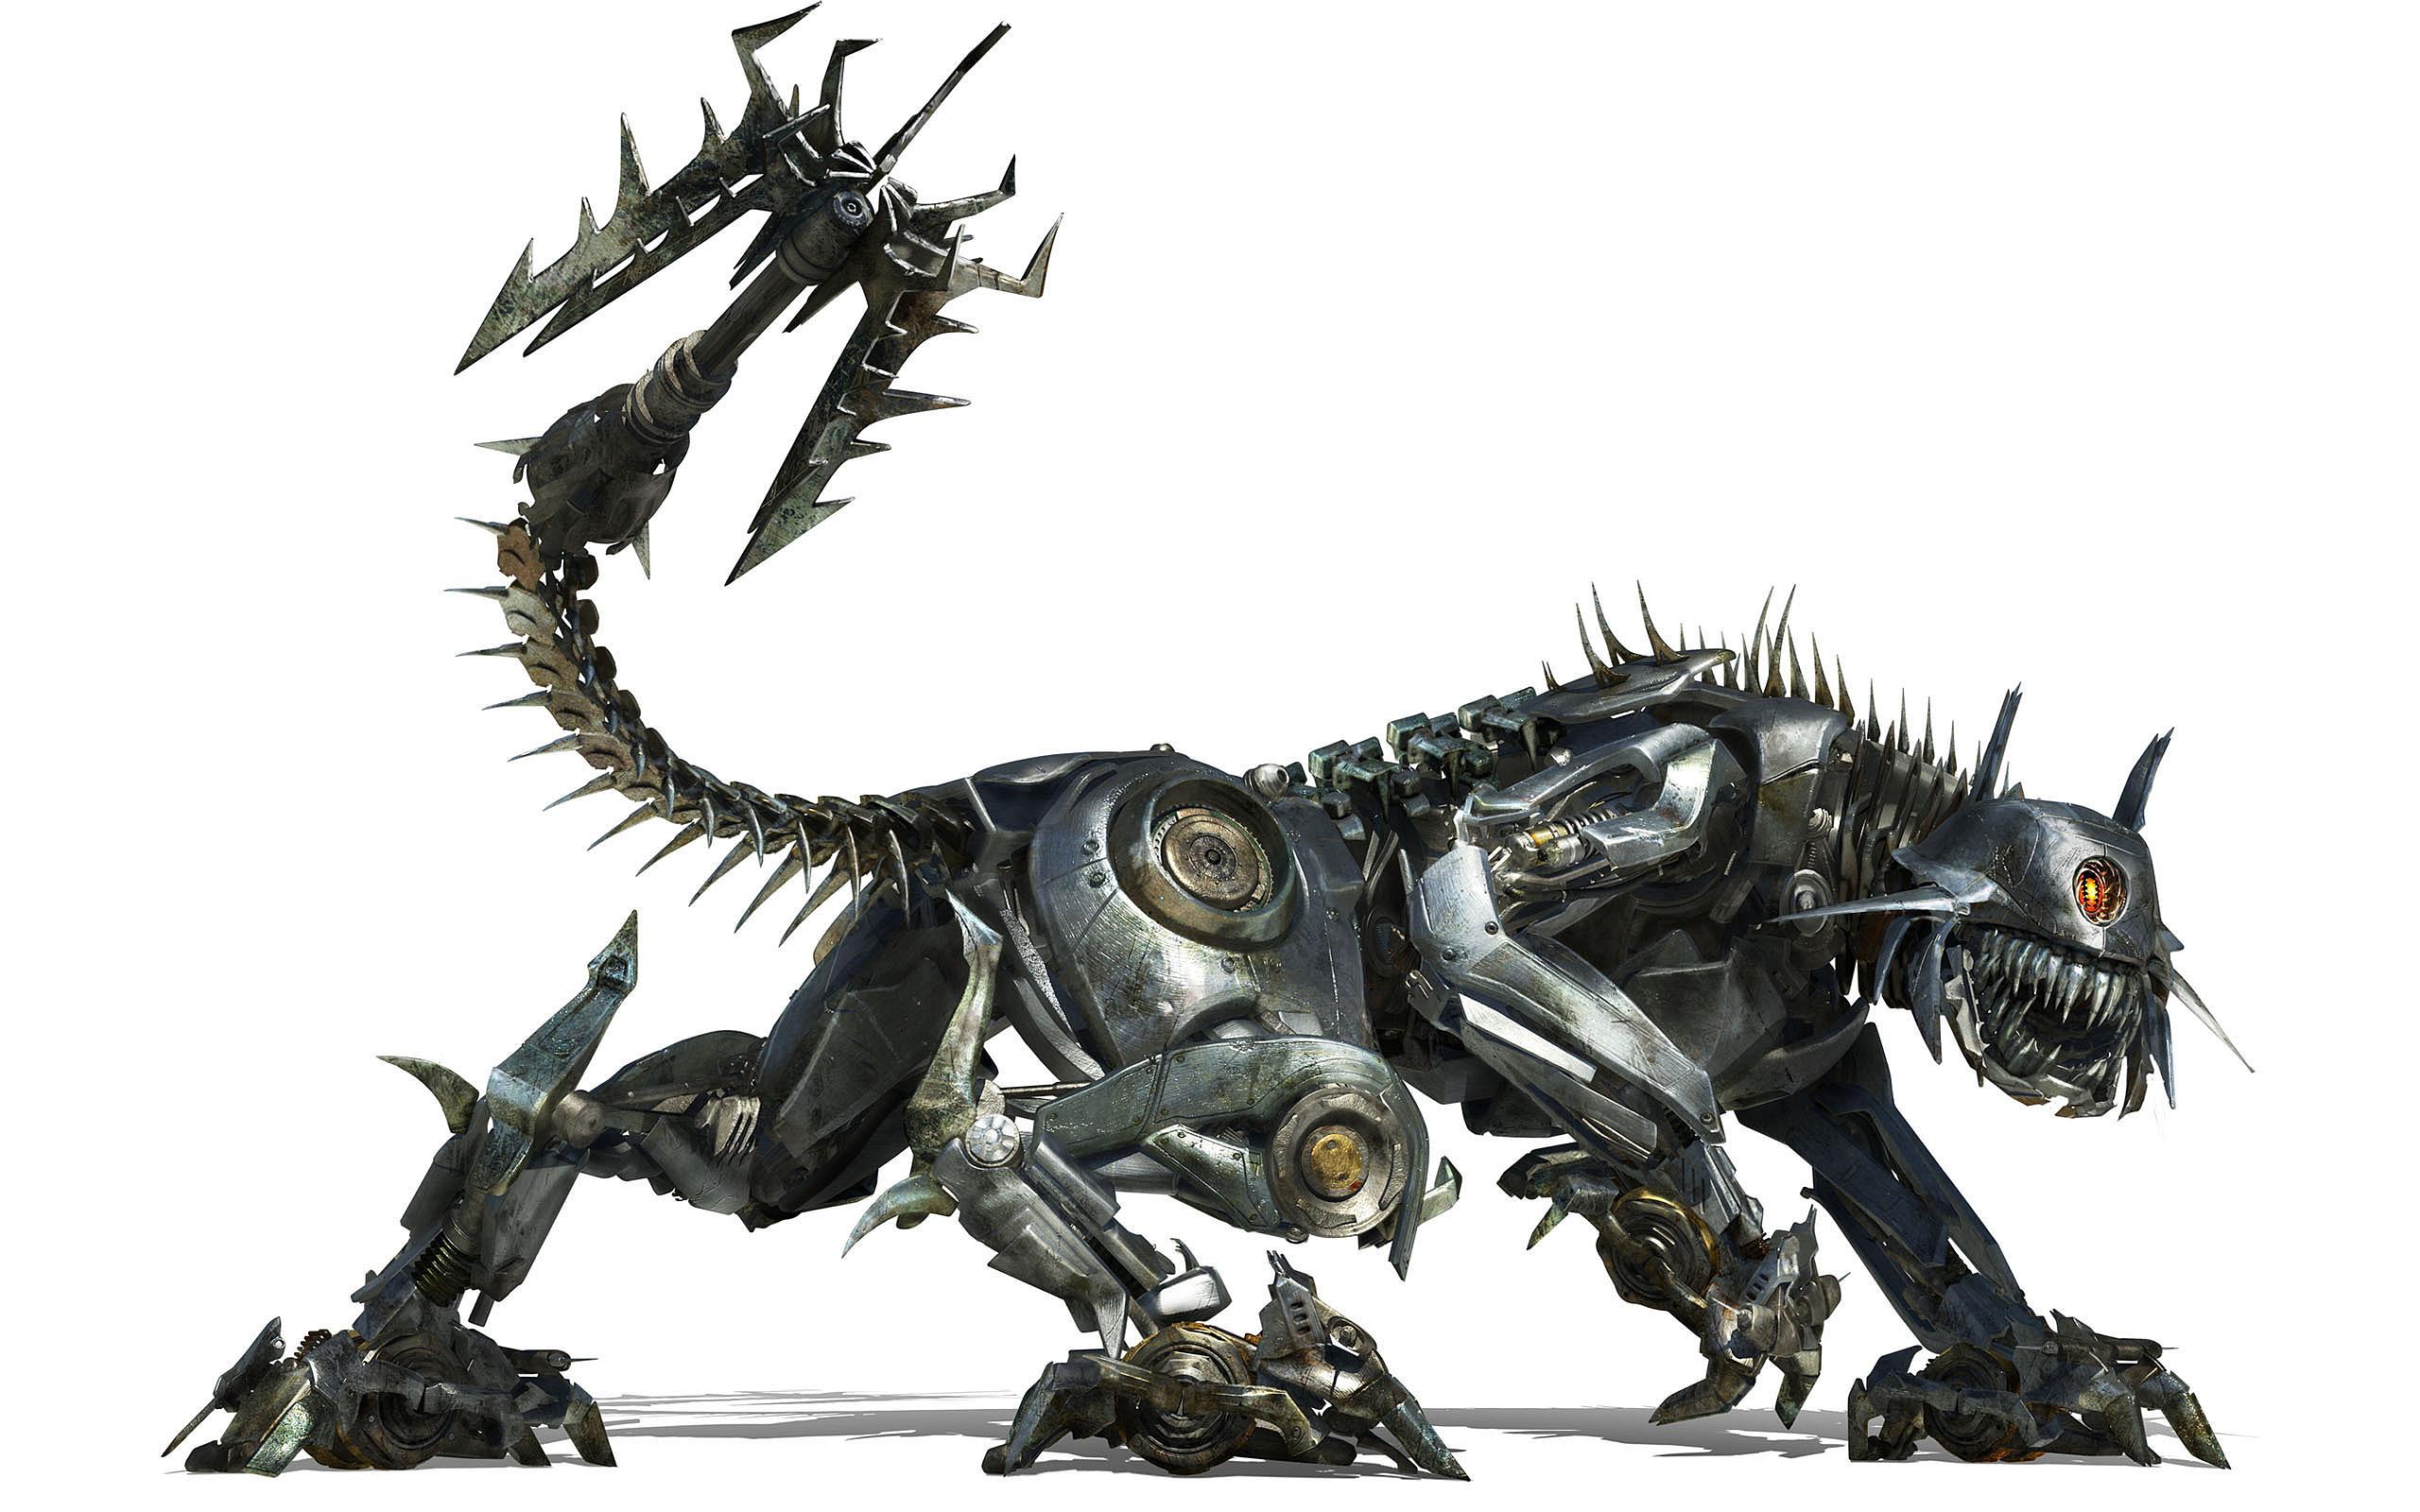 Robot Predator